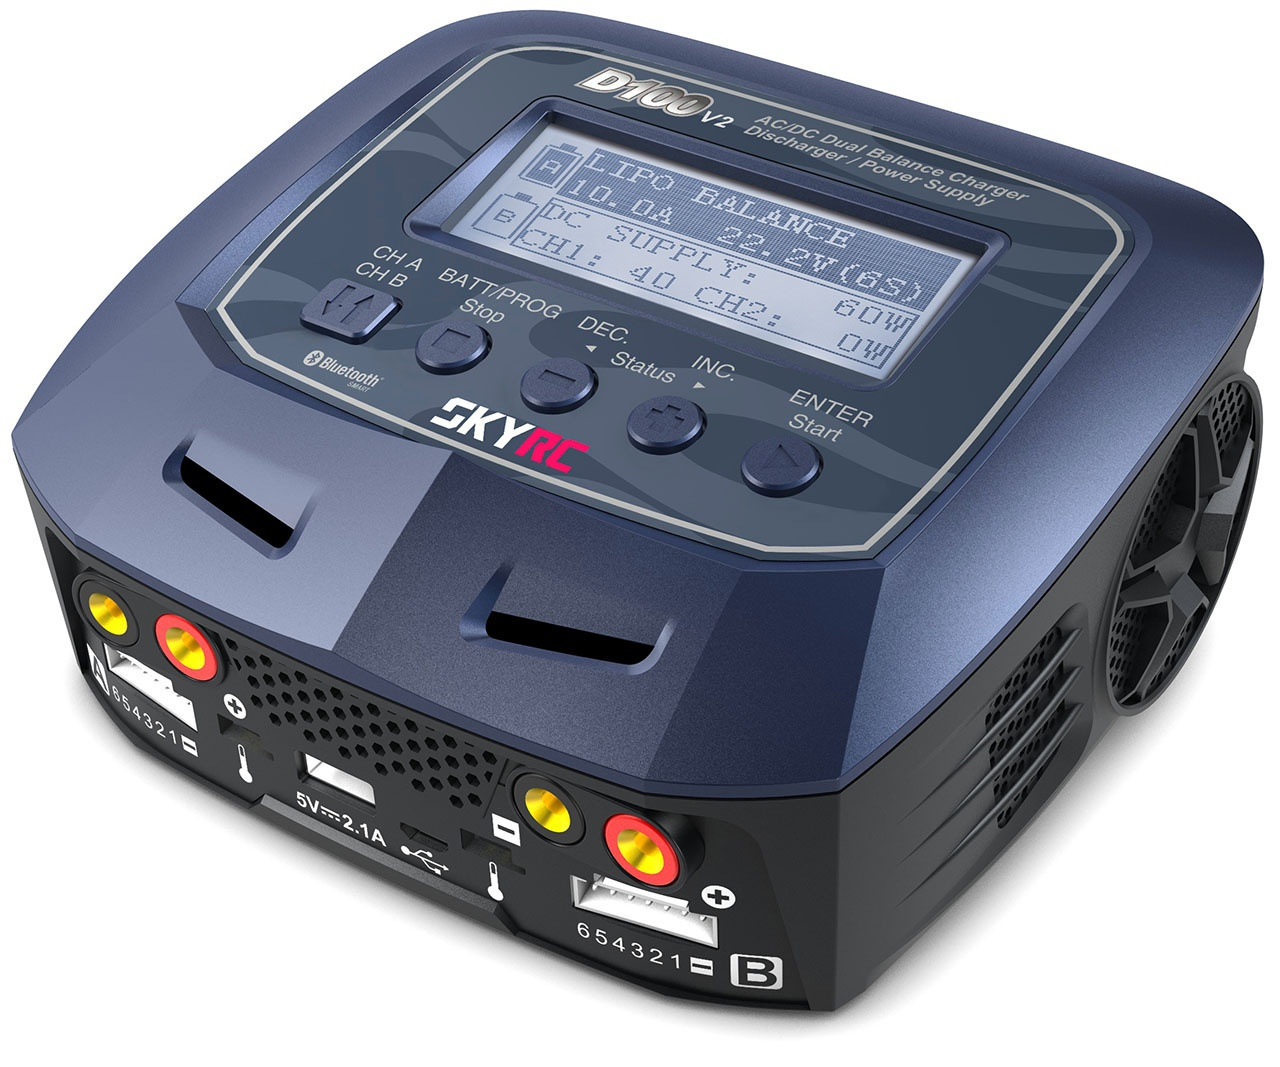 Ladegerät D100 V2 AC/DC DUO LiPo 1-6s 10A 100W  *SK100131